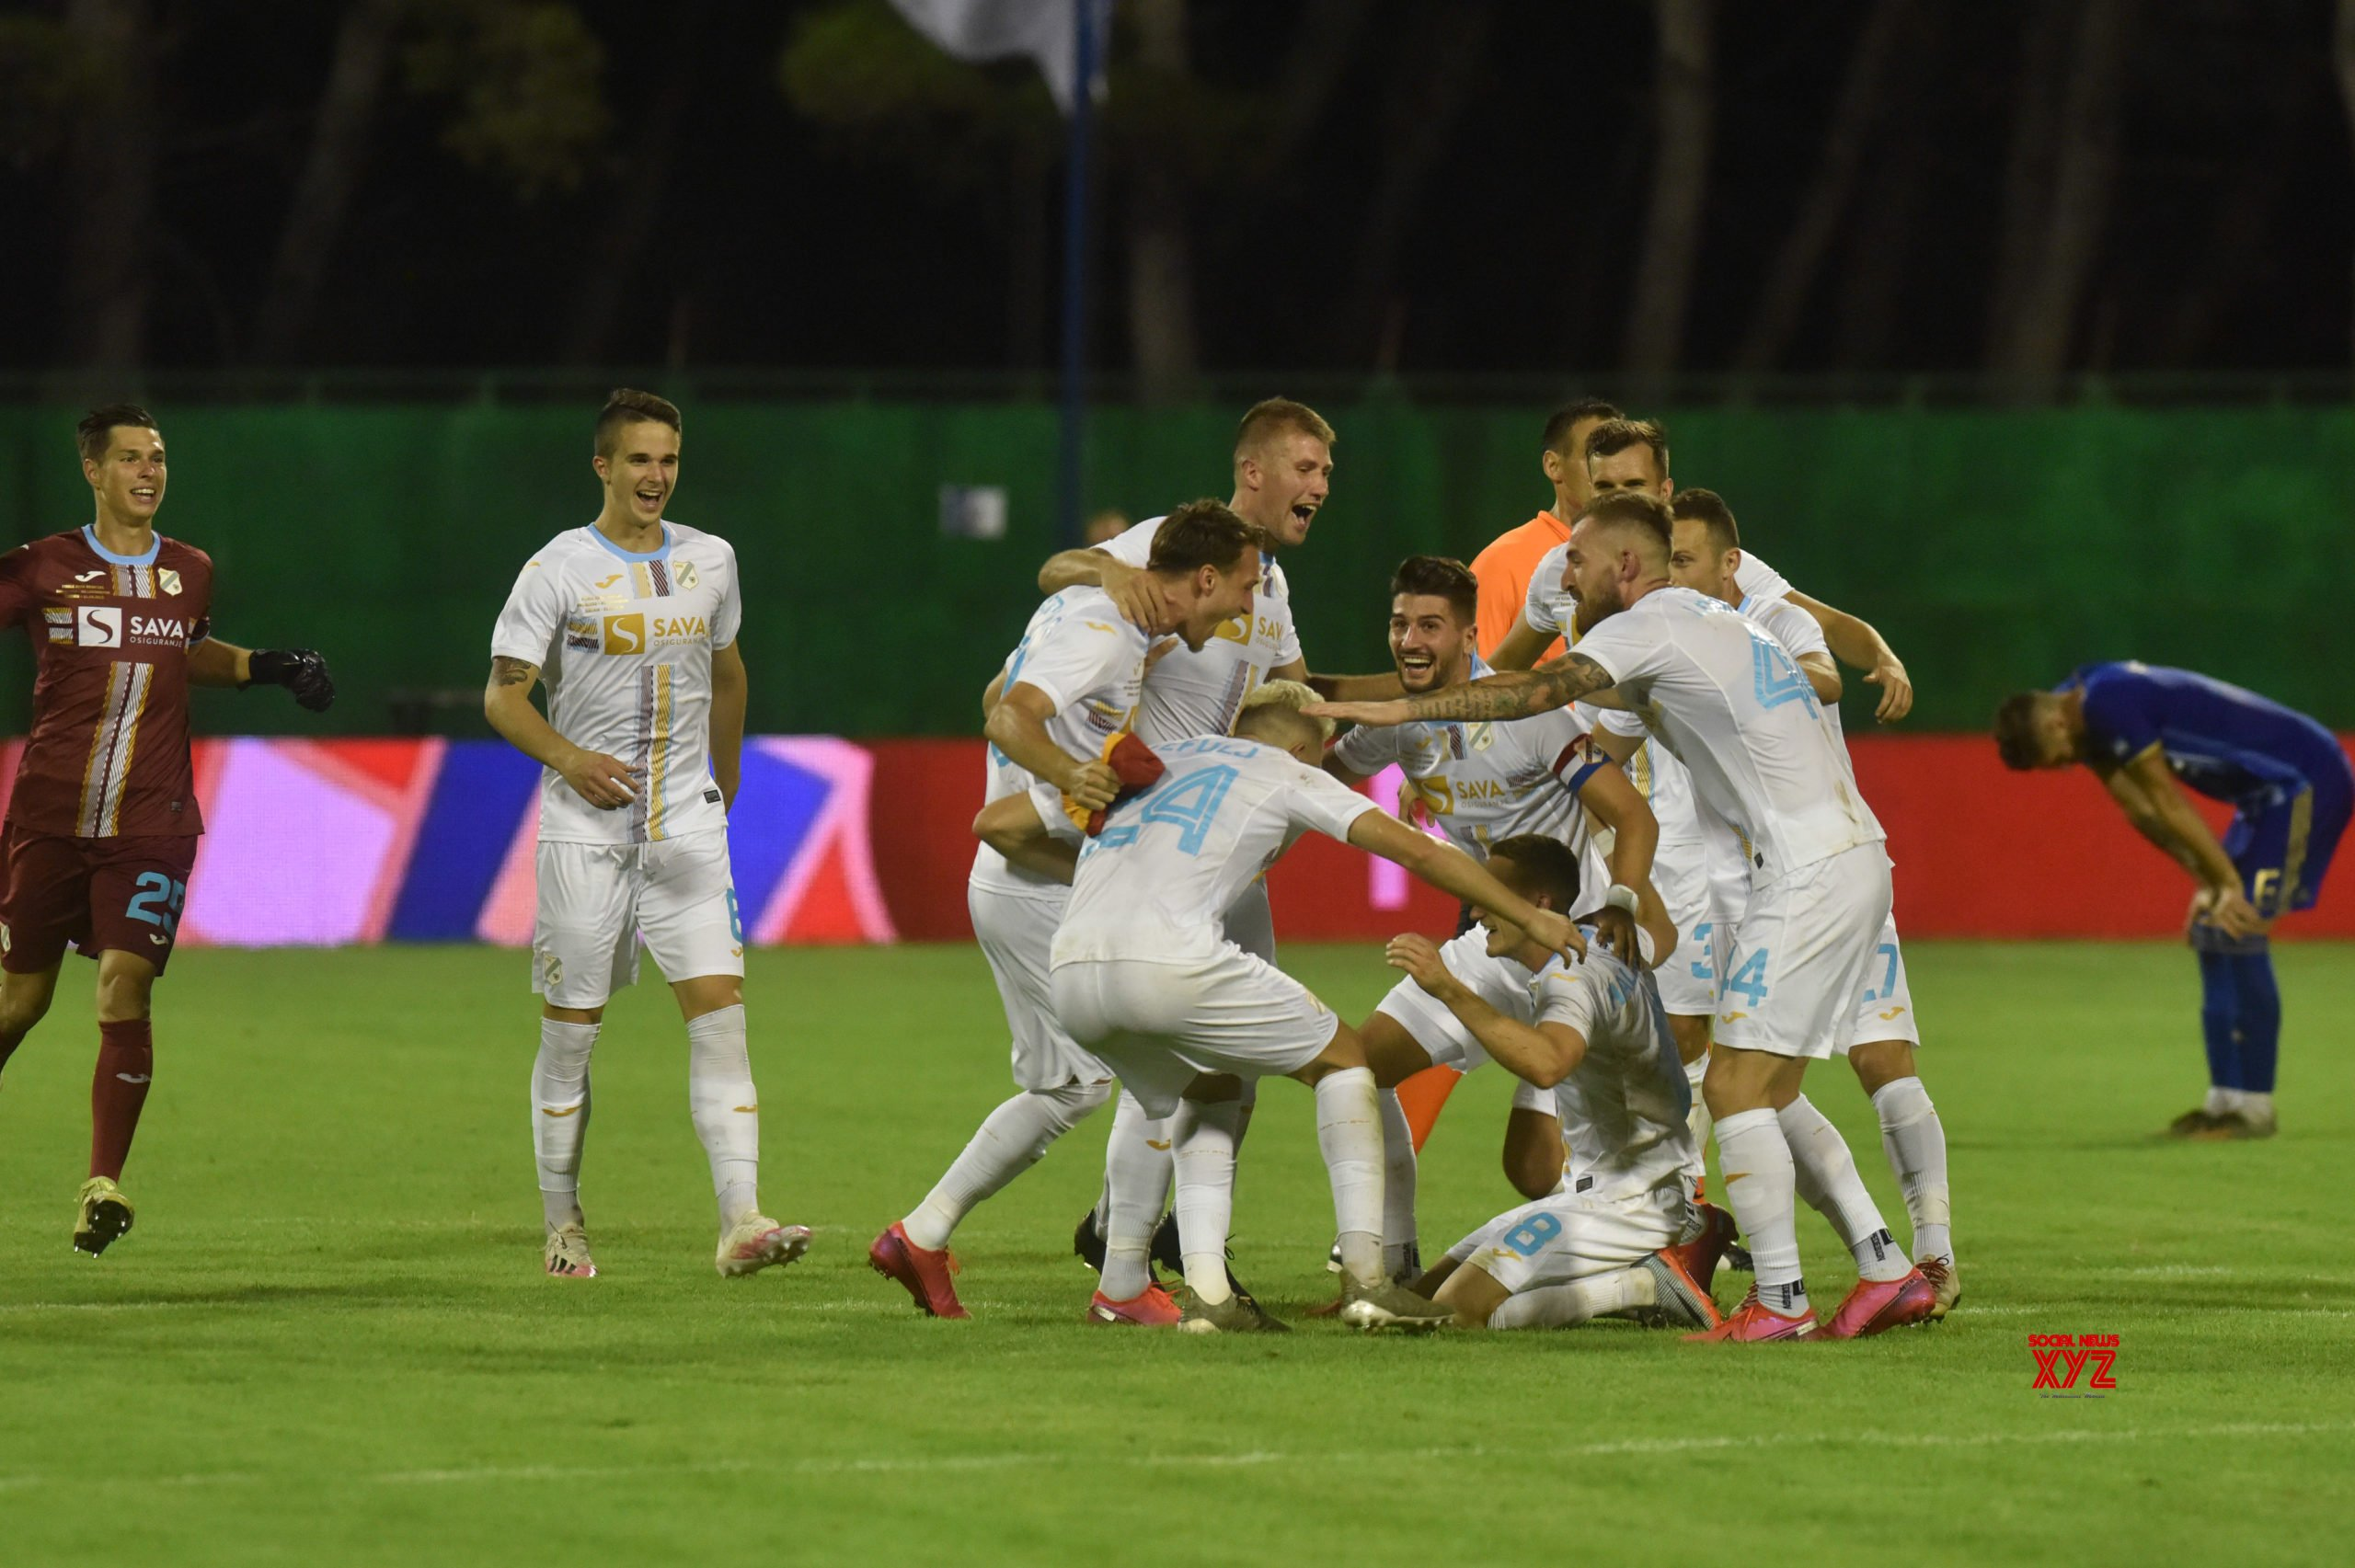 CROATIA - SIBENIK - CROATIAN FOOTBALL CUP - FINAL #Gallery